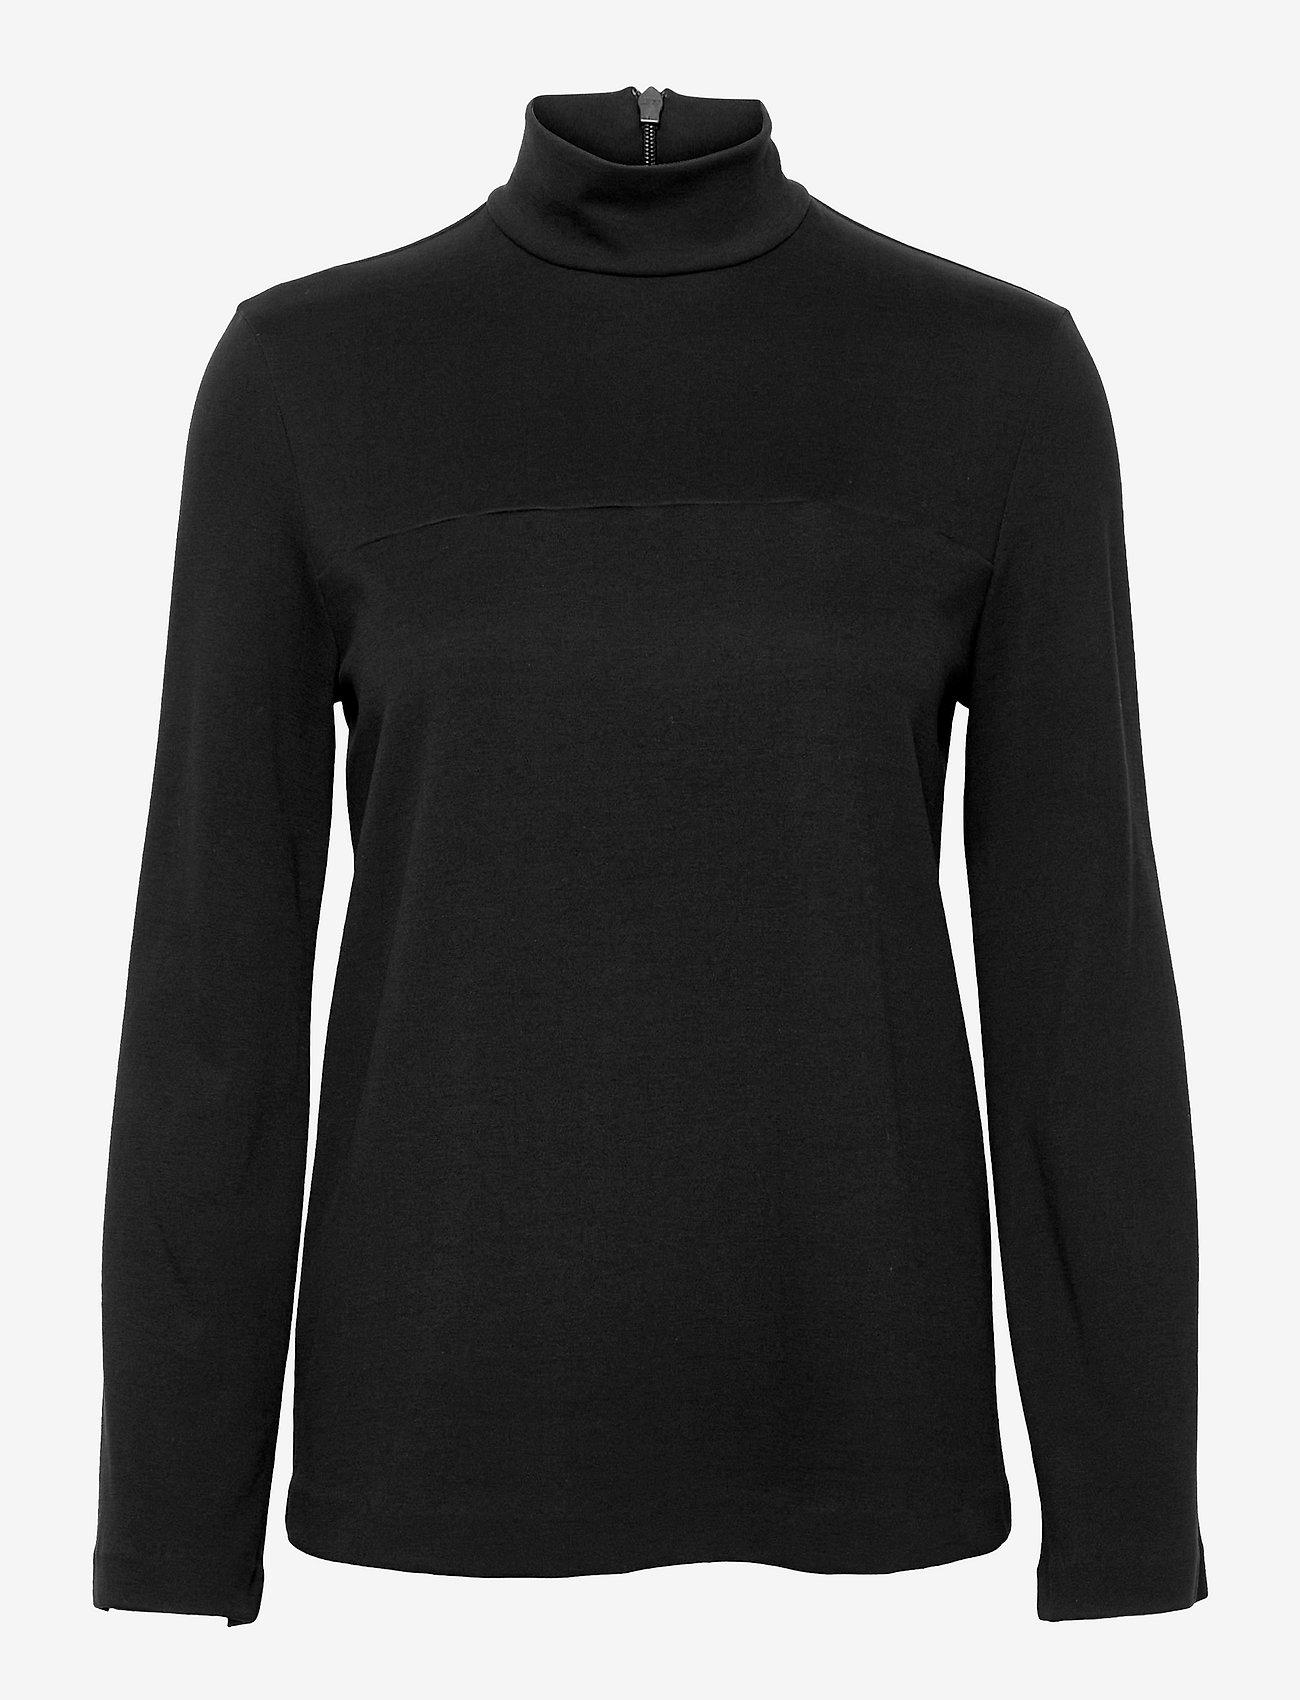 Max Mara Leisure - ETHEL - long-sleeved tops - black - 0